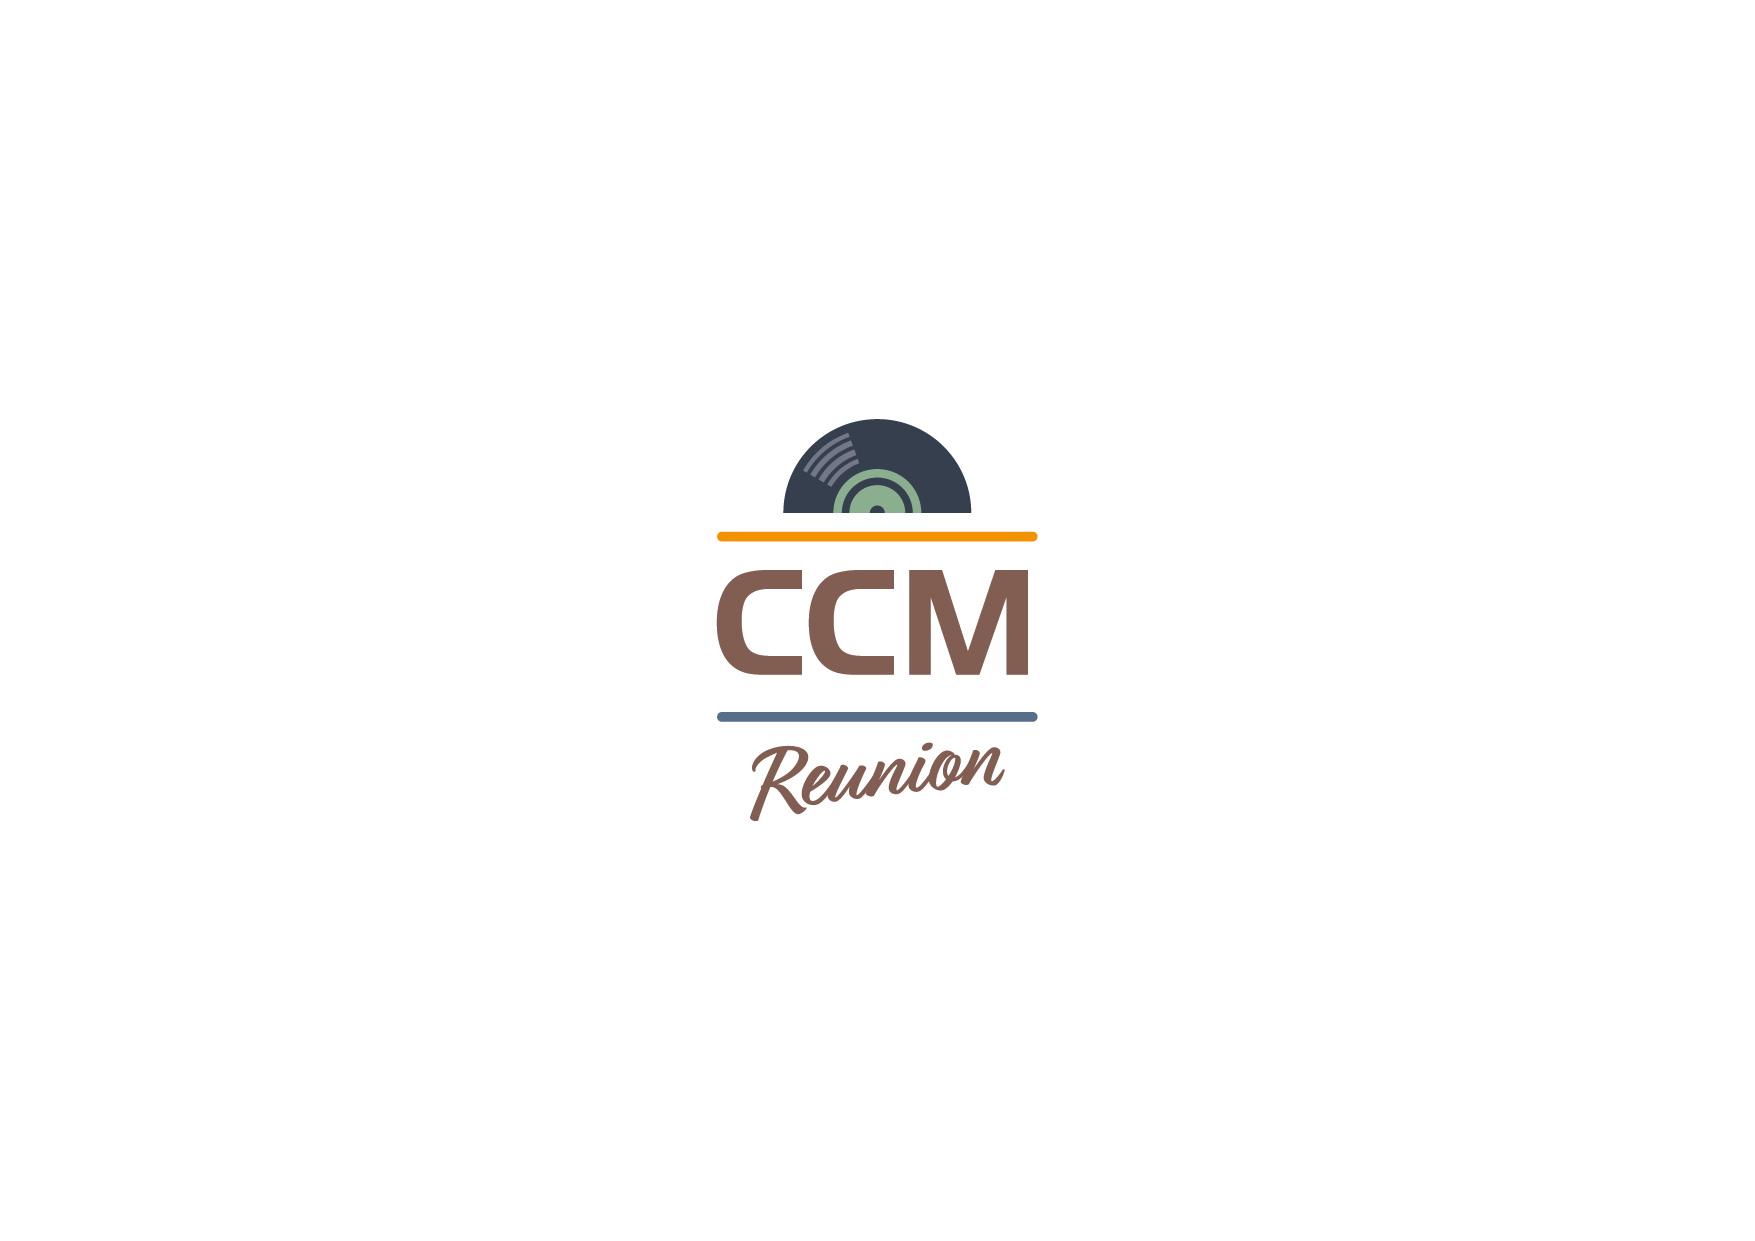 Create a retro-modern, music-inspired logo for CCM Reunion